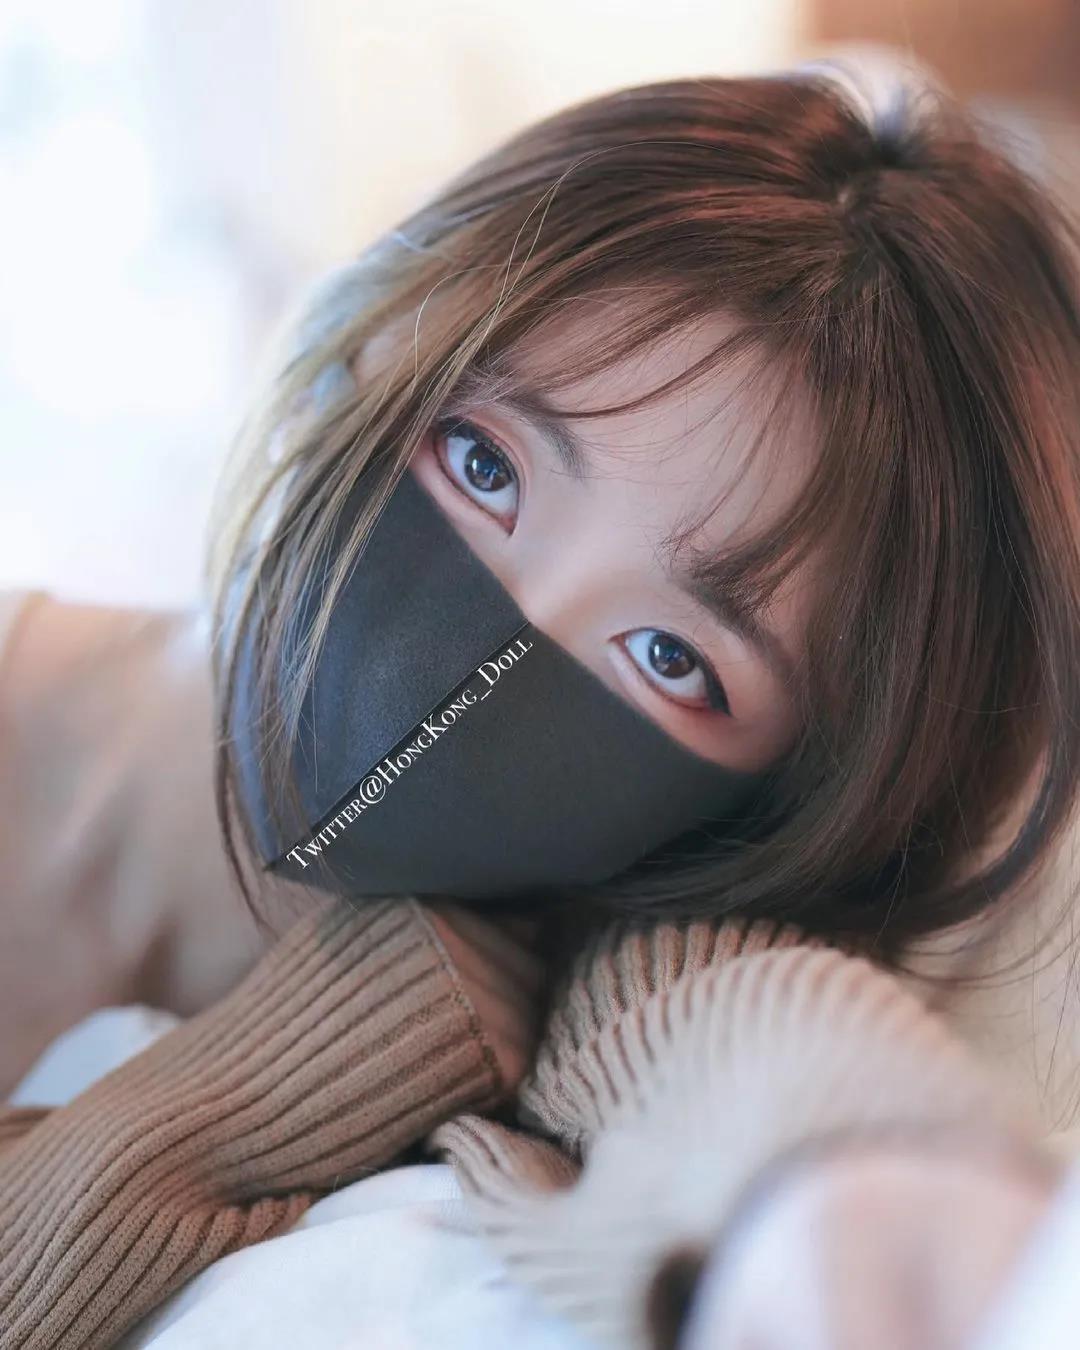 P站新晋女神[hongkongdoll]香港玩偶姐 桃花眼太迷人 网络美女 第7张